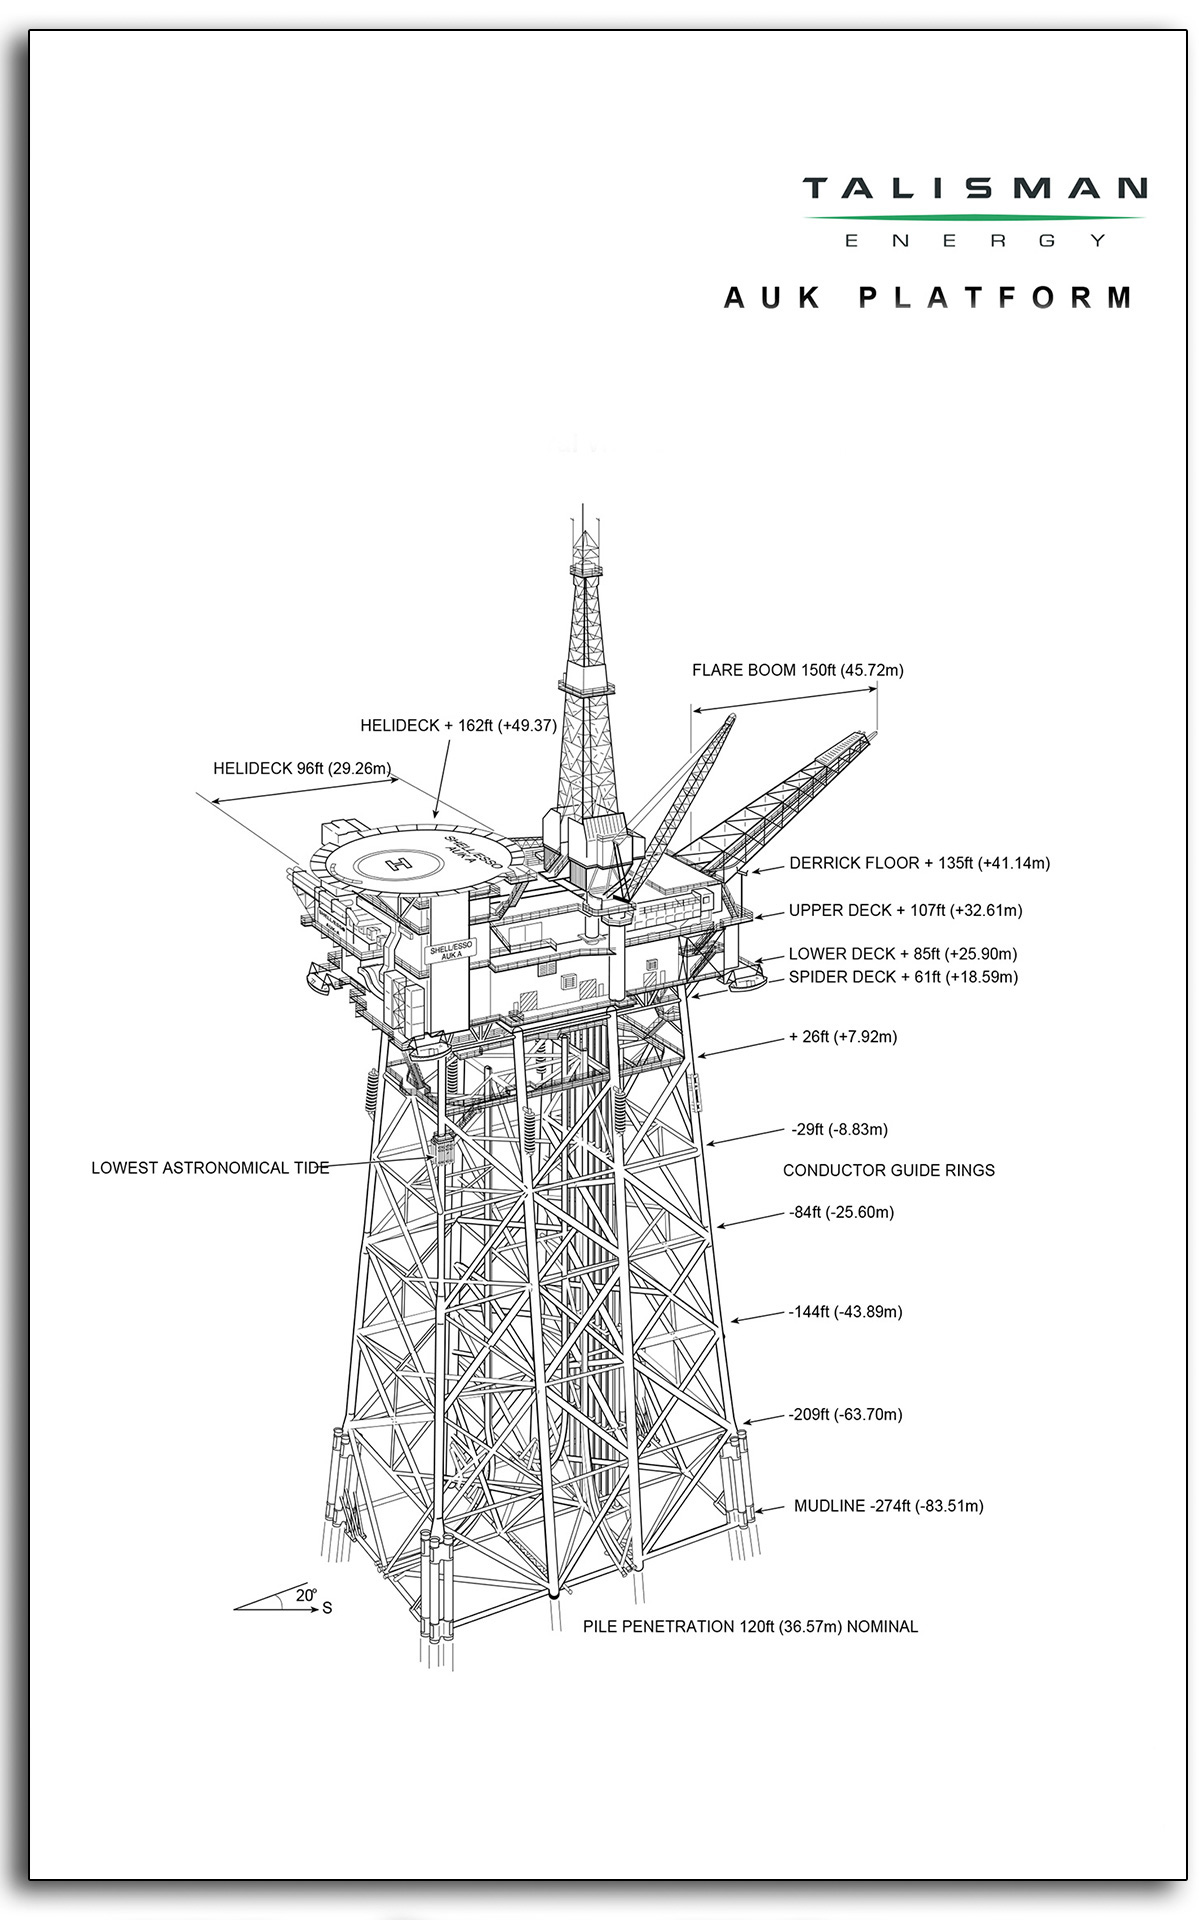 13 Talisman Auk north sea oil and gas platform plans drawing